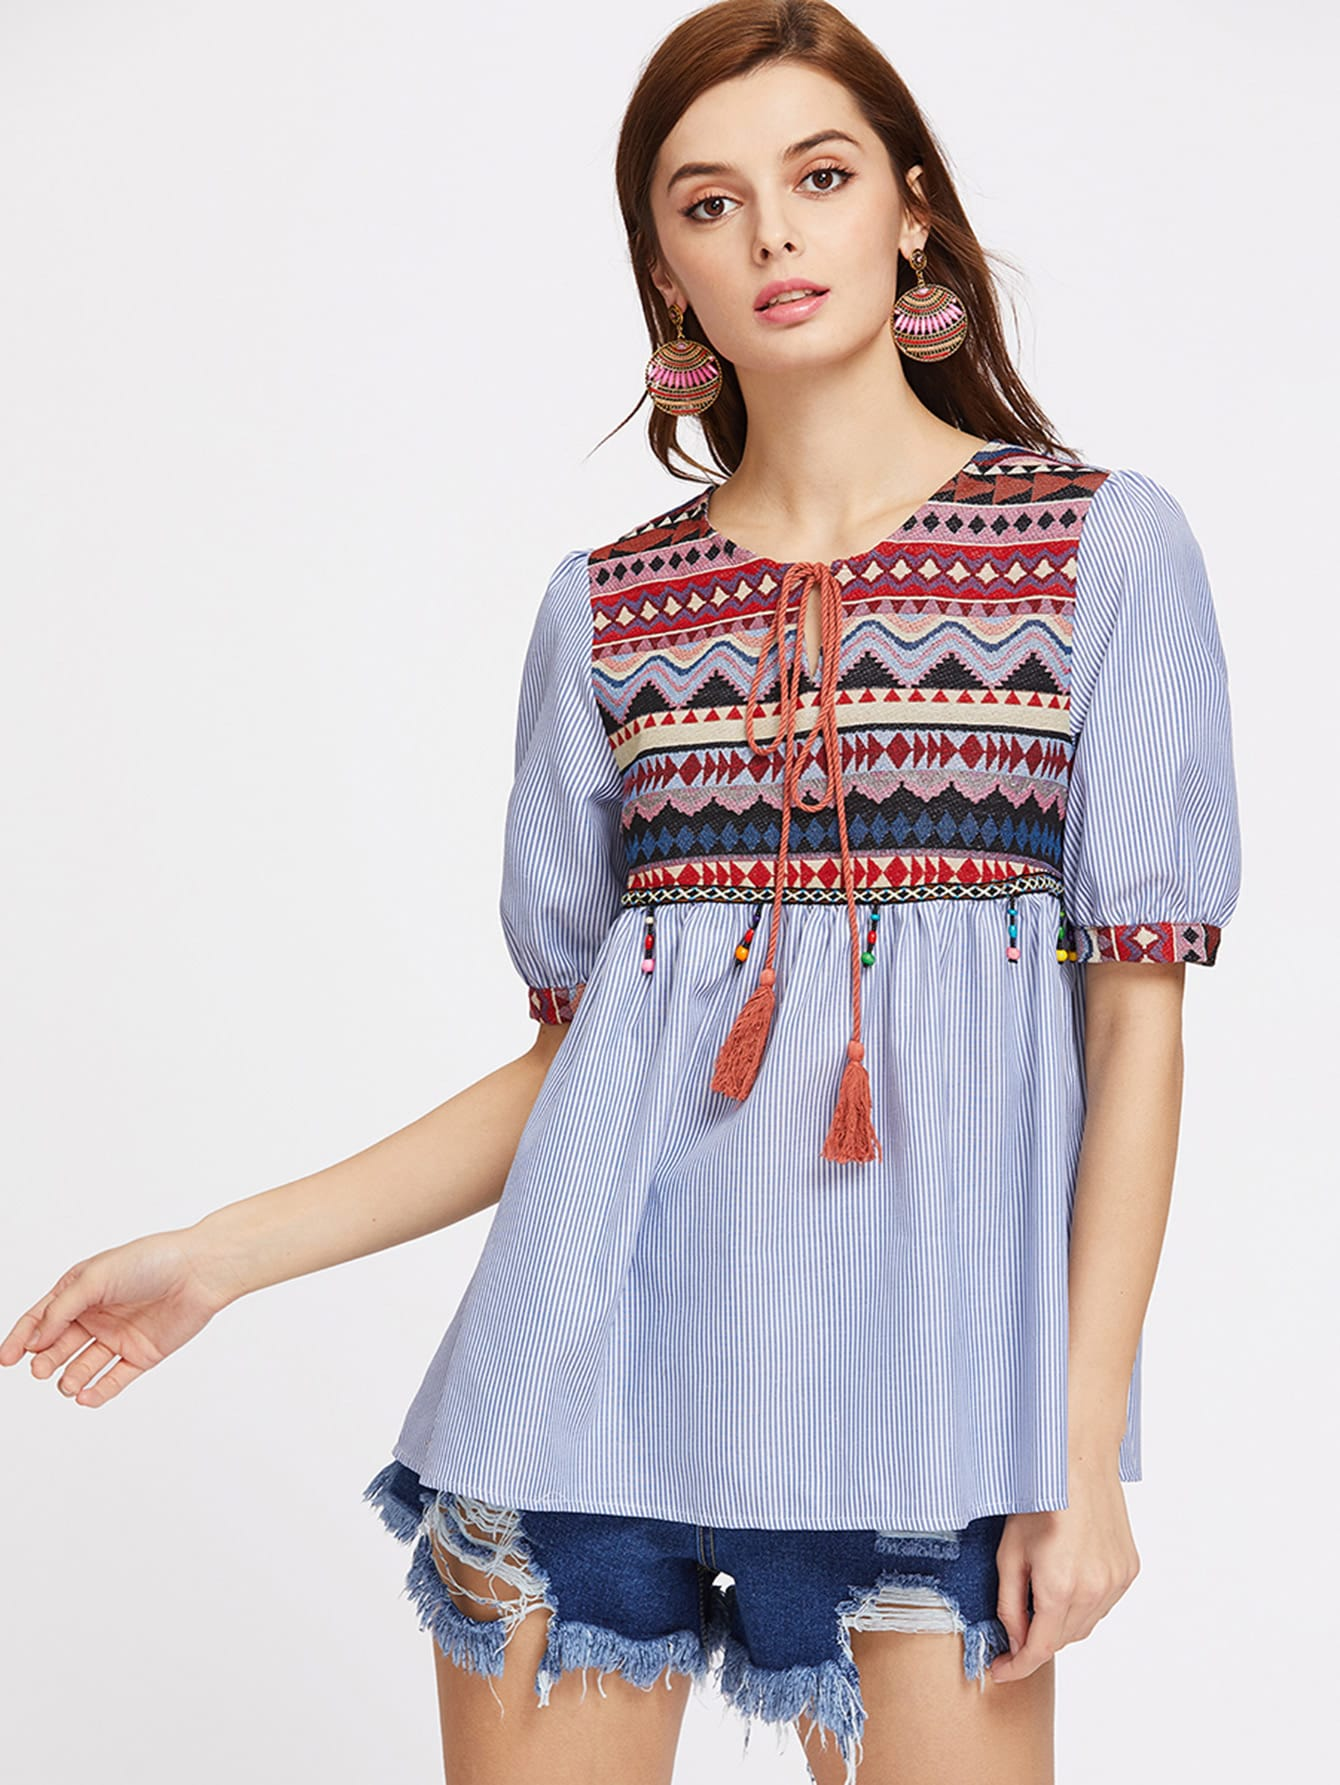 Jacquard Yoke Tasseled Tie Beaded Fringe Trim Babydoll Top blouse170405703